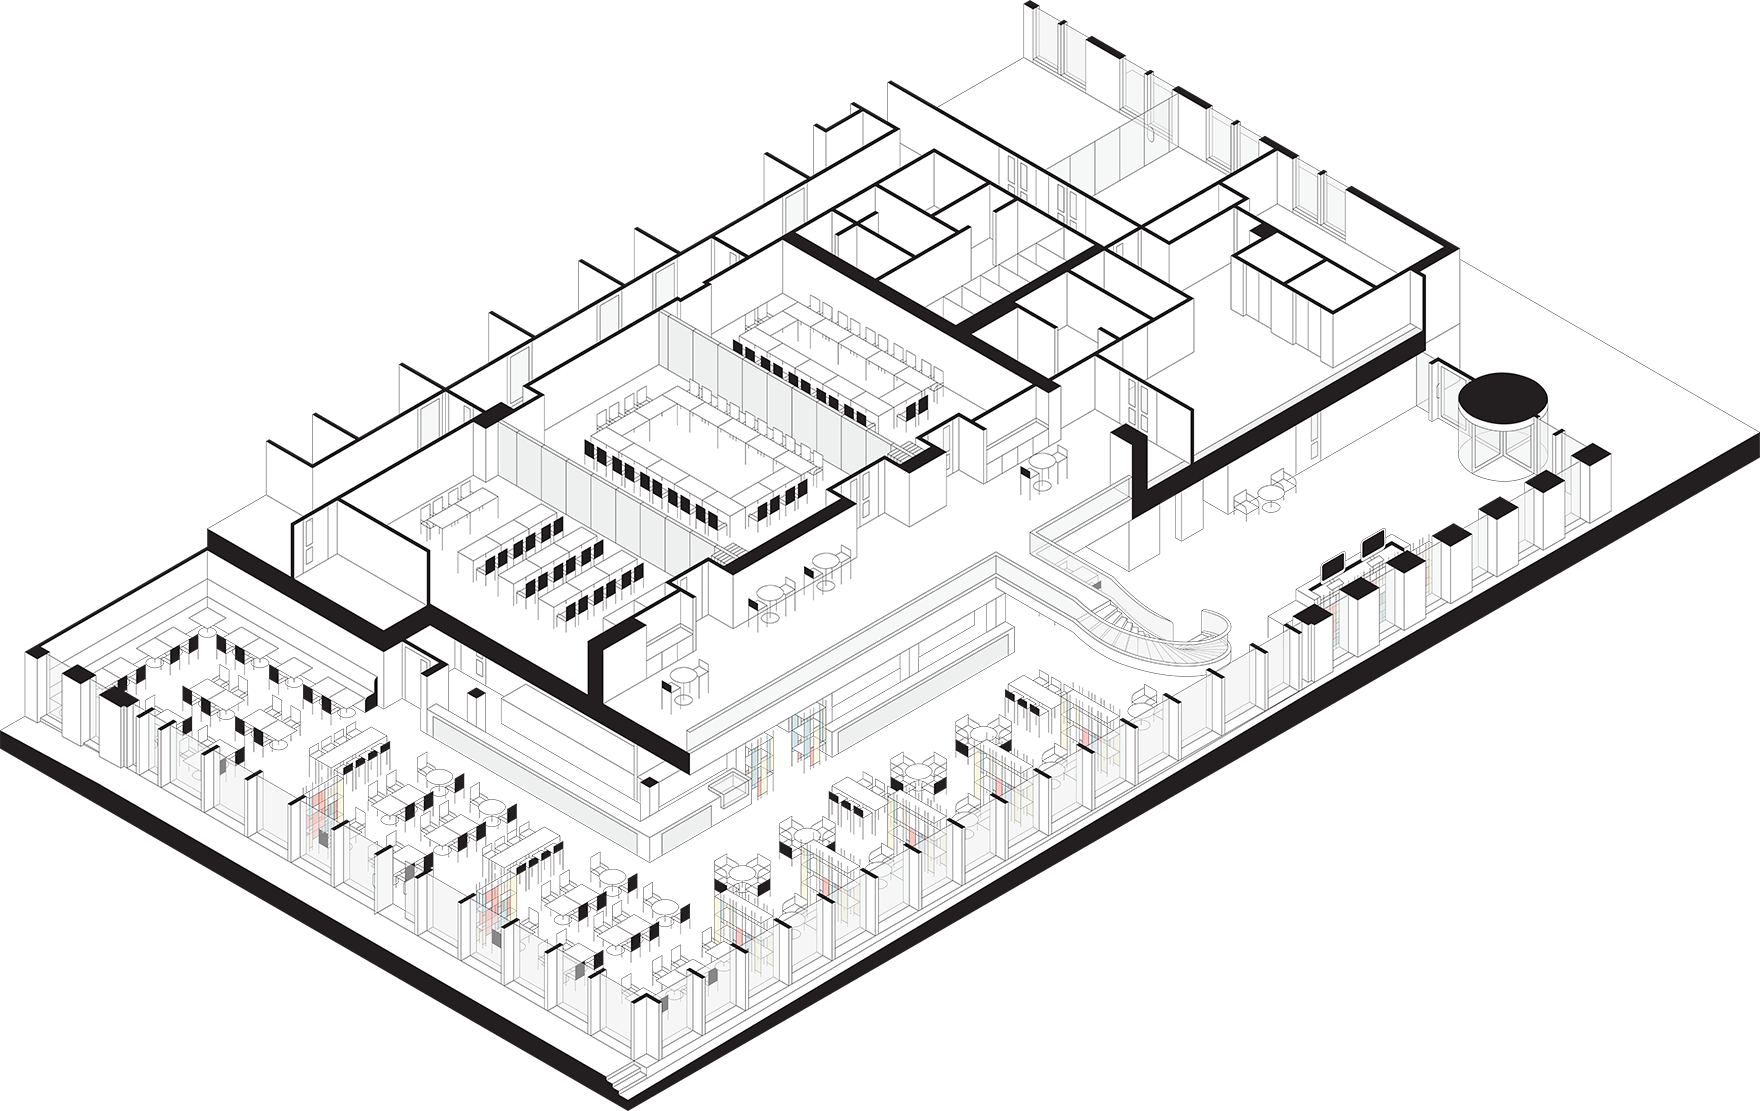 Melia Hotel Newcastle Quayside Ground Floor Axonometric Illustration L